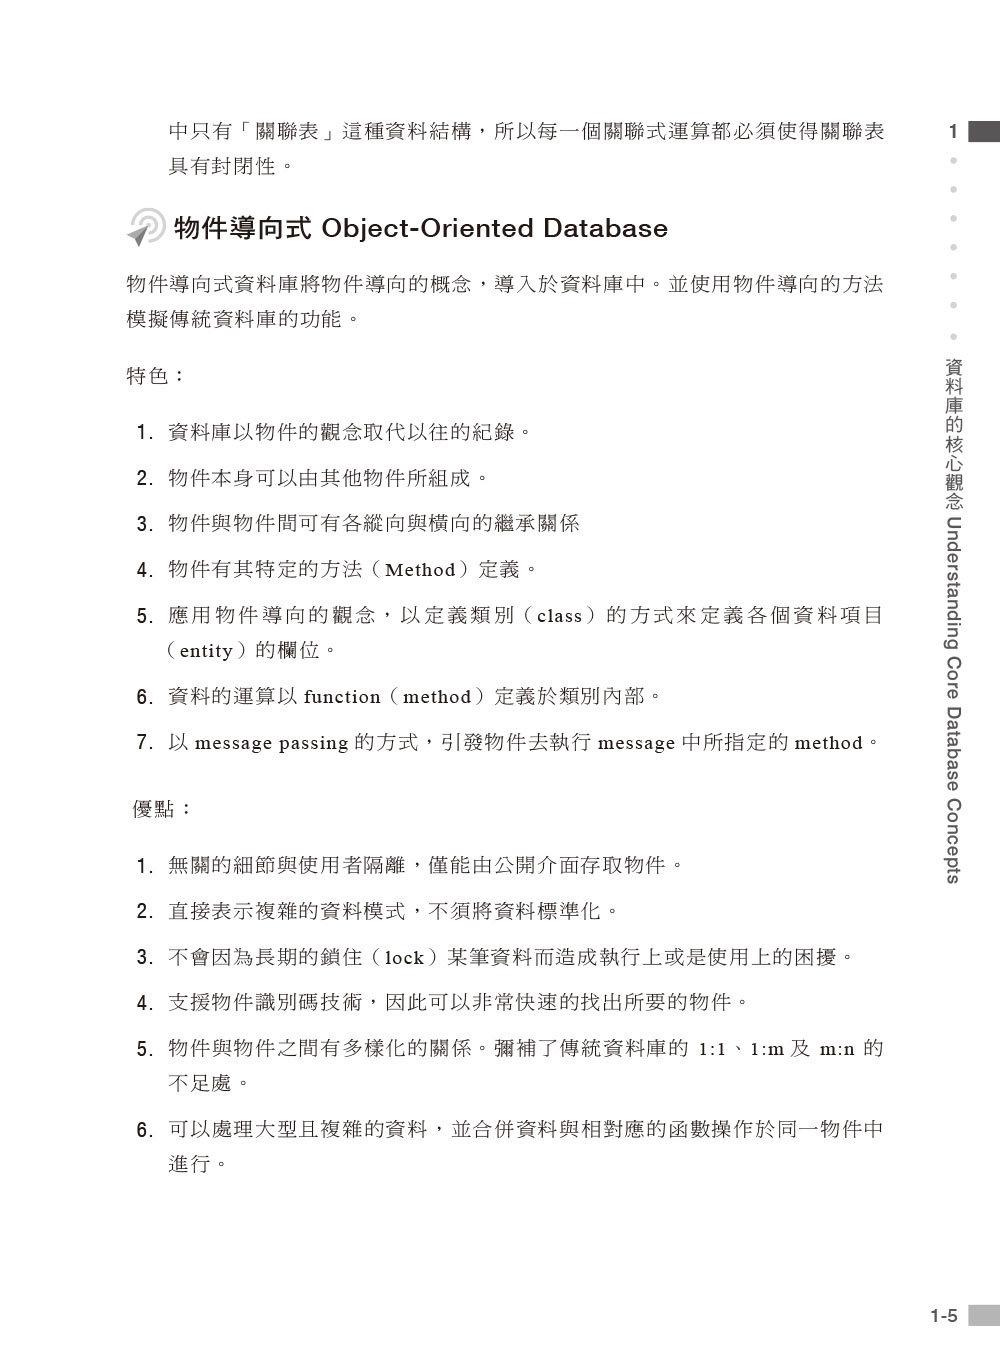 MTA Database Fundamentals 資料庫管理 國際認證教戰手冊 (98-364)-preview-5